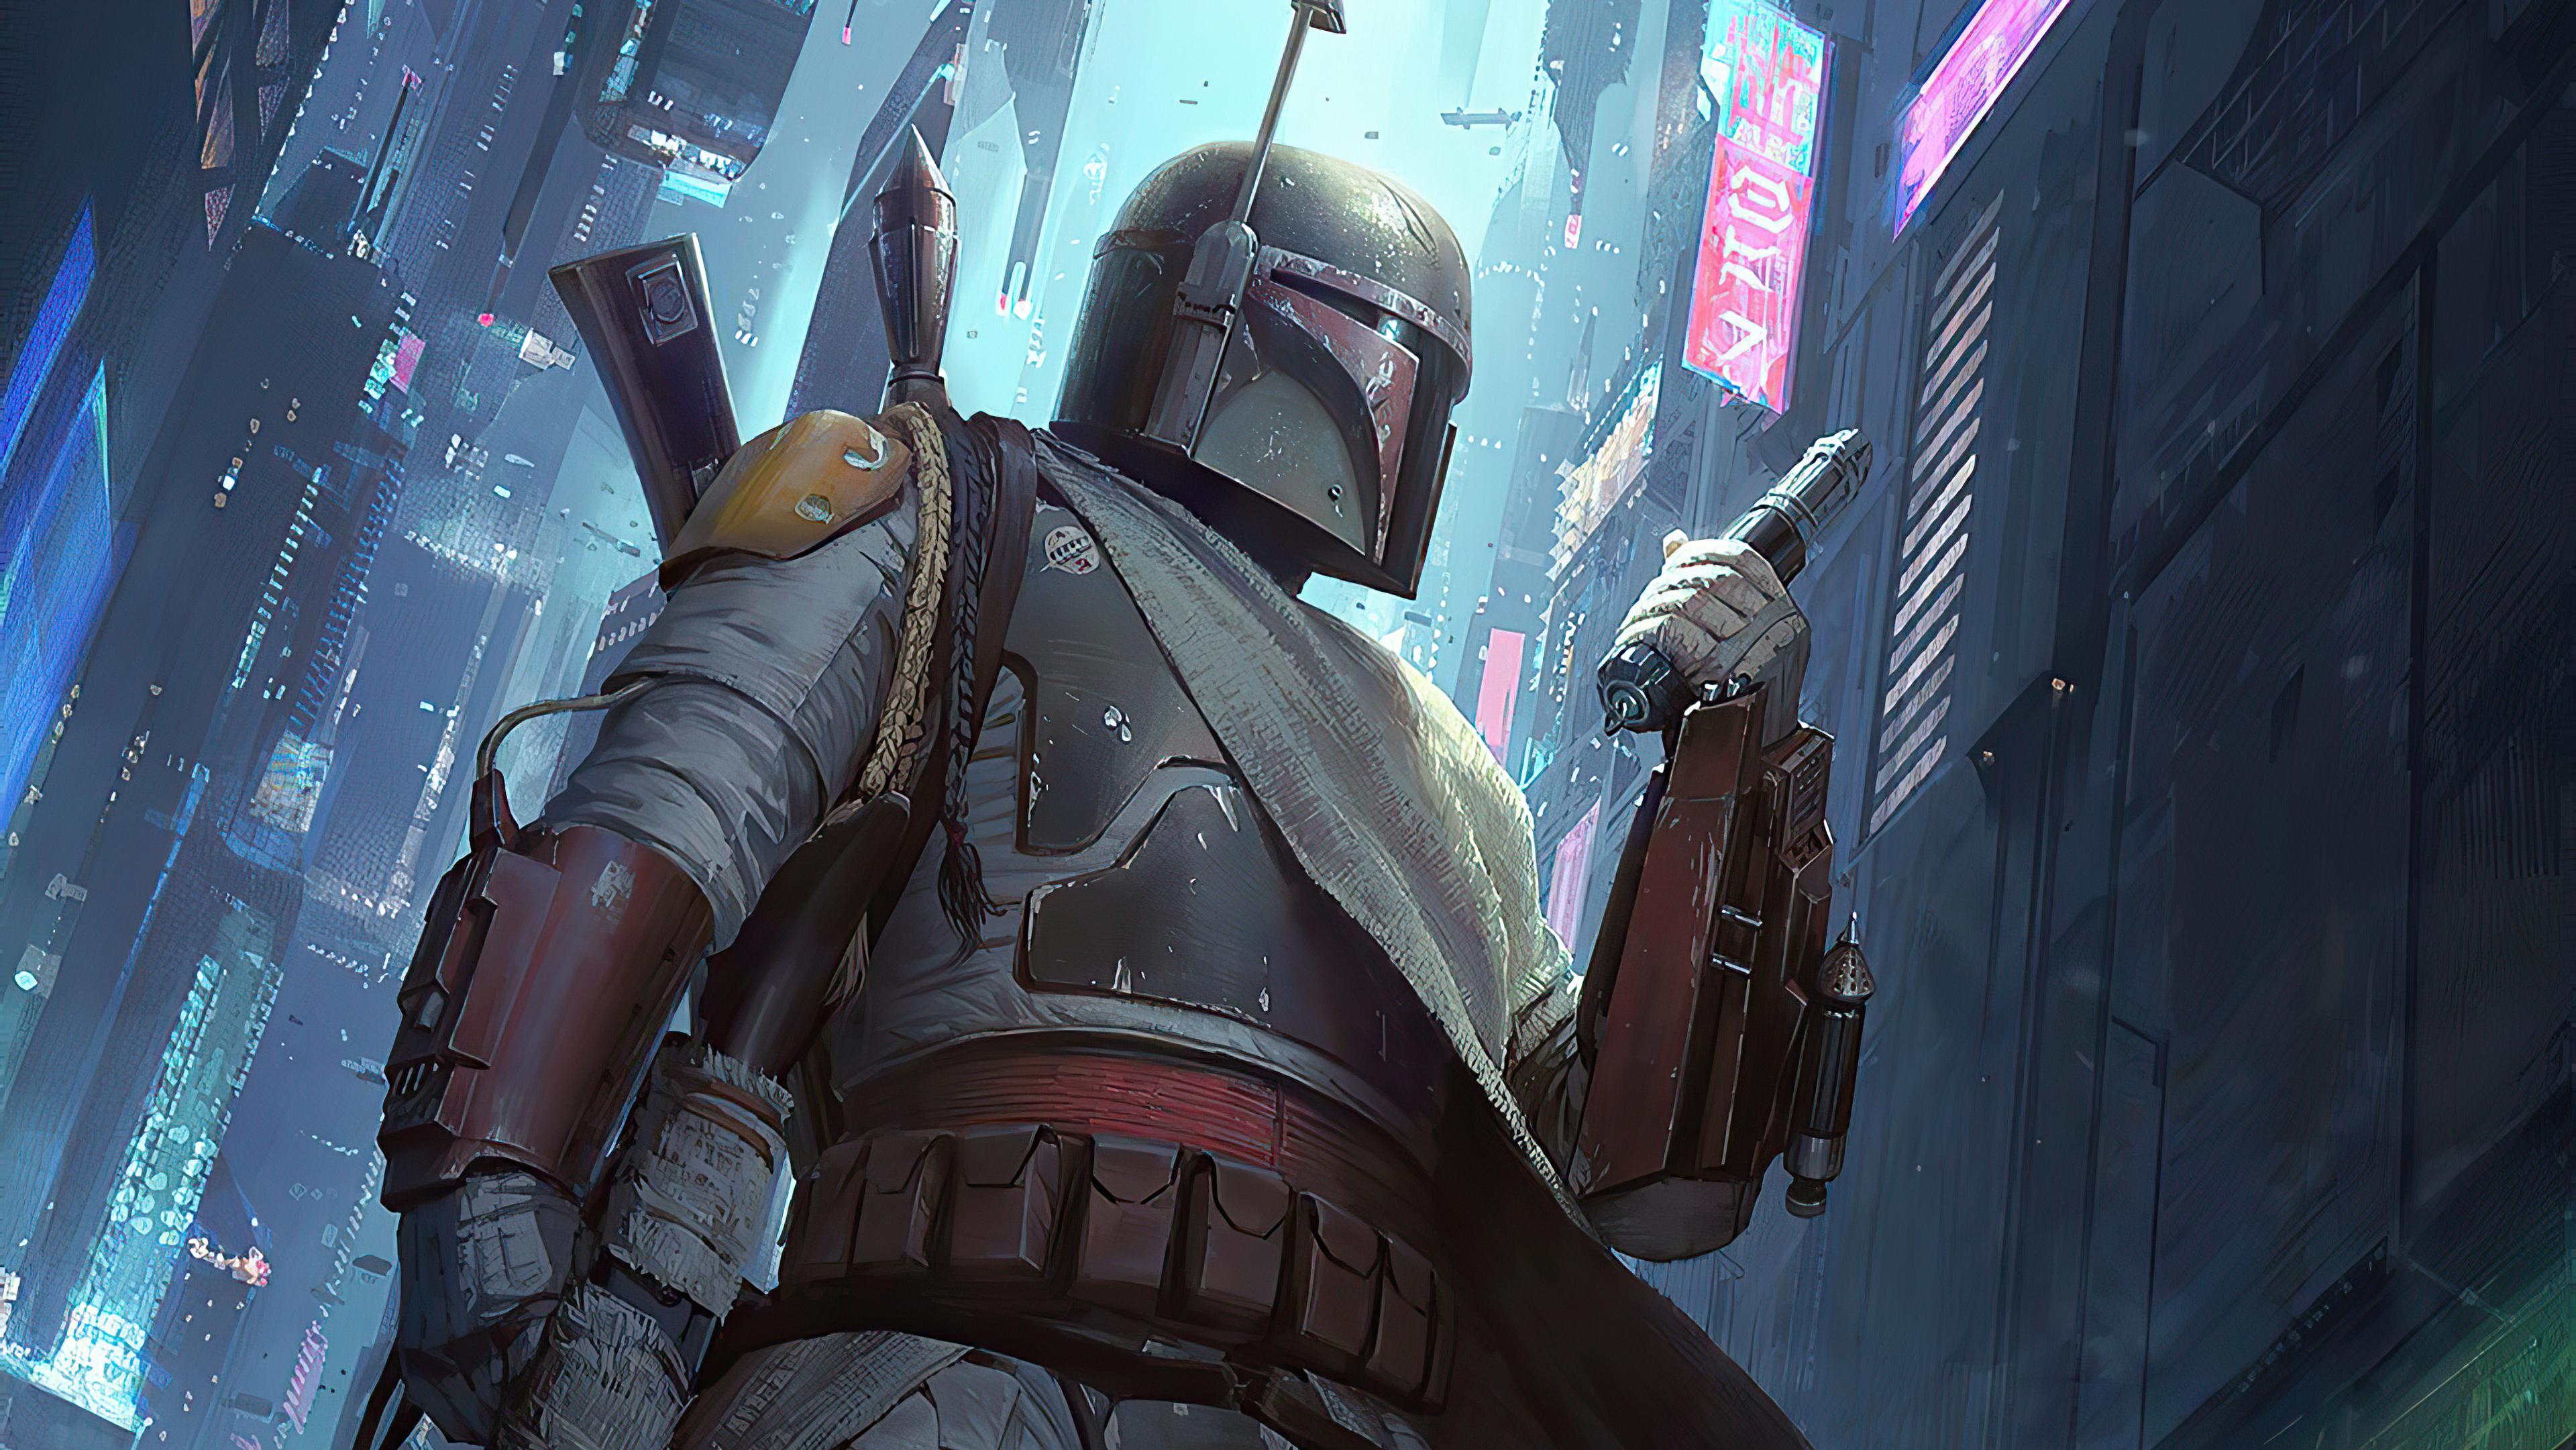 Star Wars Boba Fett, HD Superheroes, 4k Wallpapers, Images ...